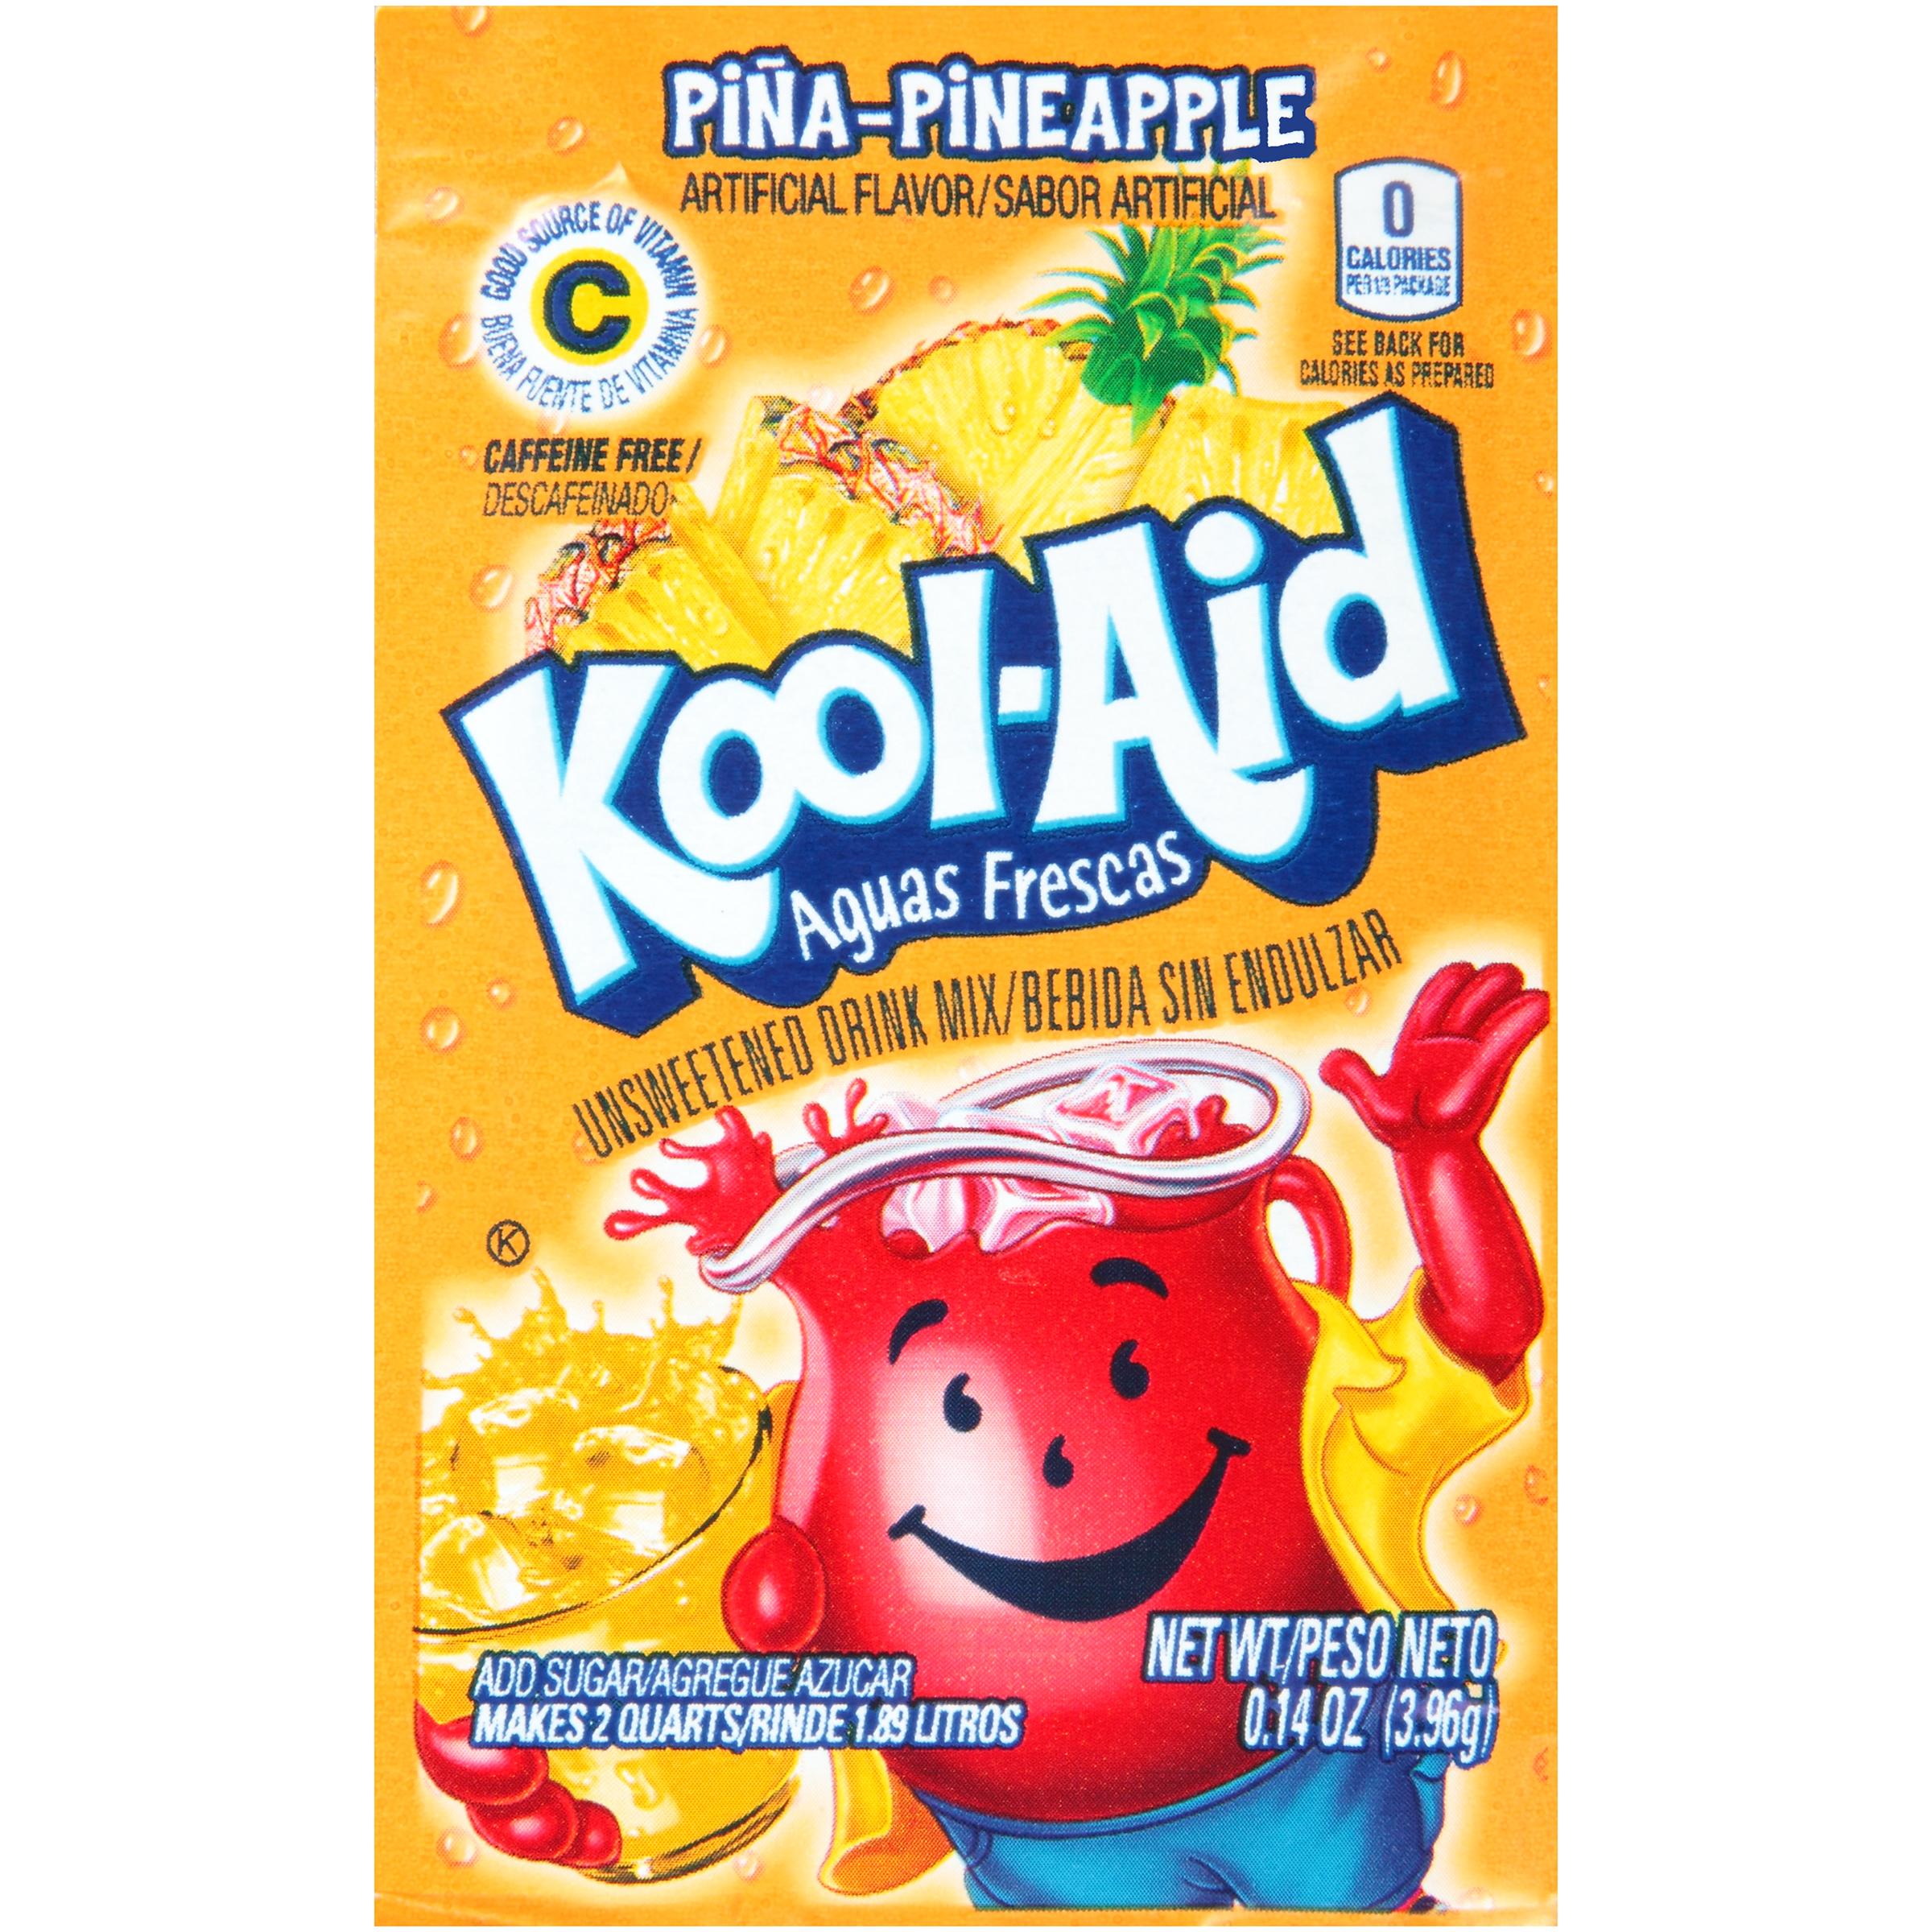 KOOL-AID Aguas Frescas Pineapple Drink Mix Unsweetened  0.14 oz Packet image